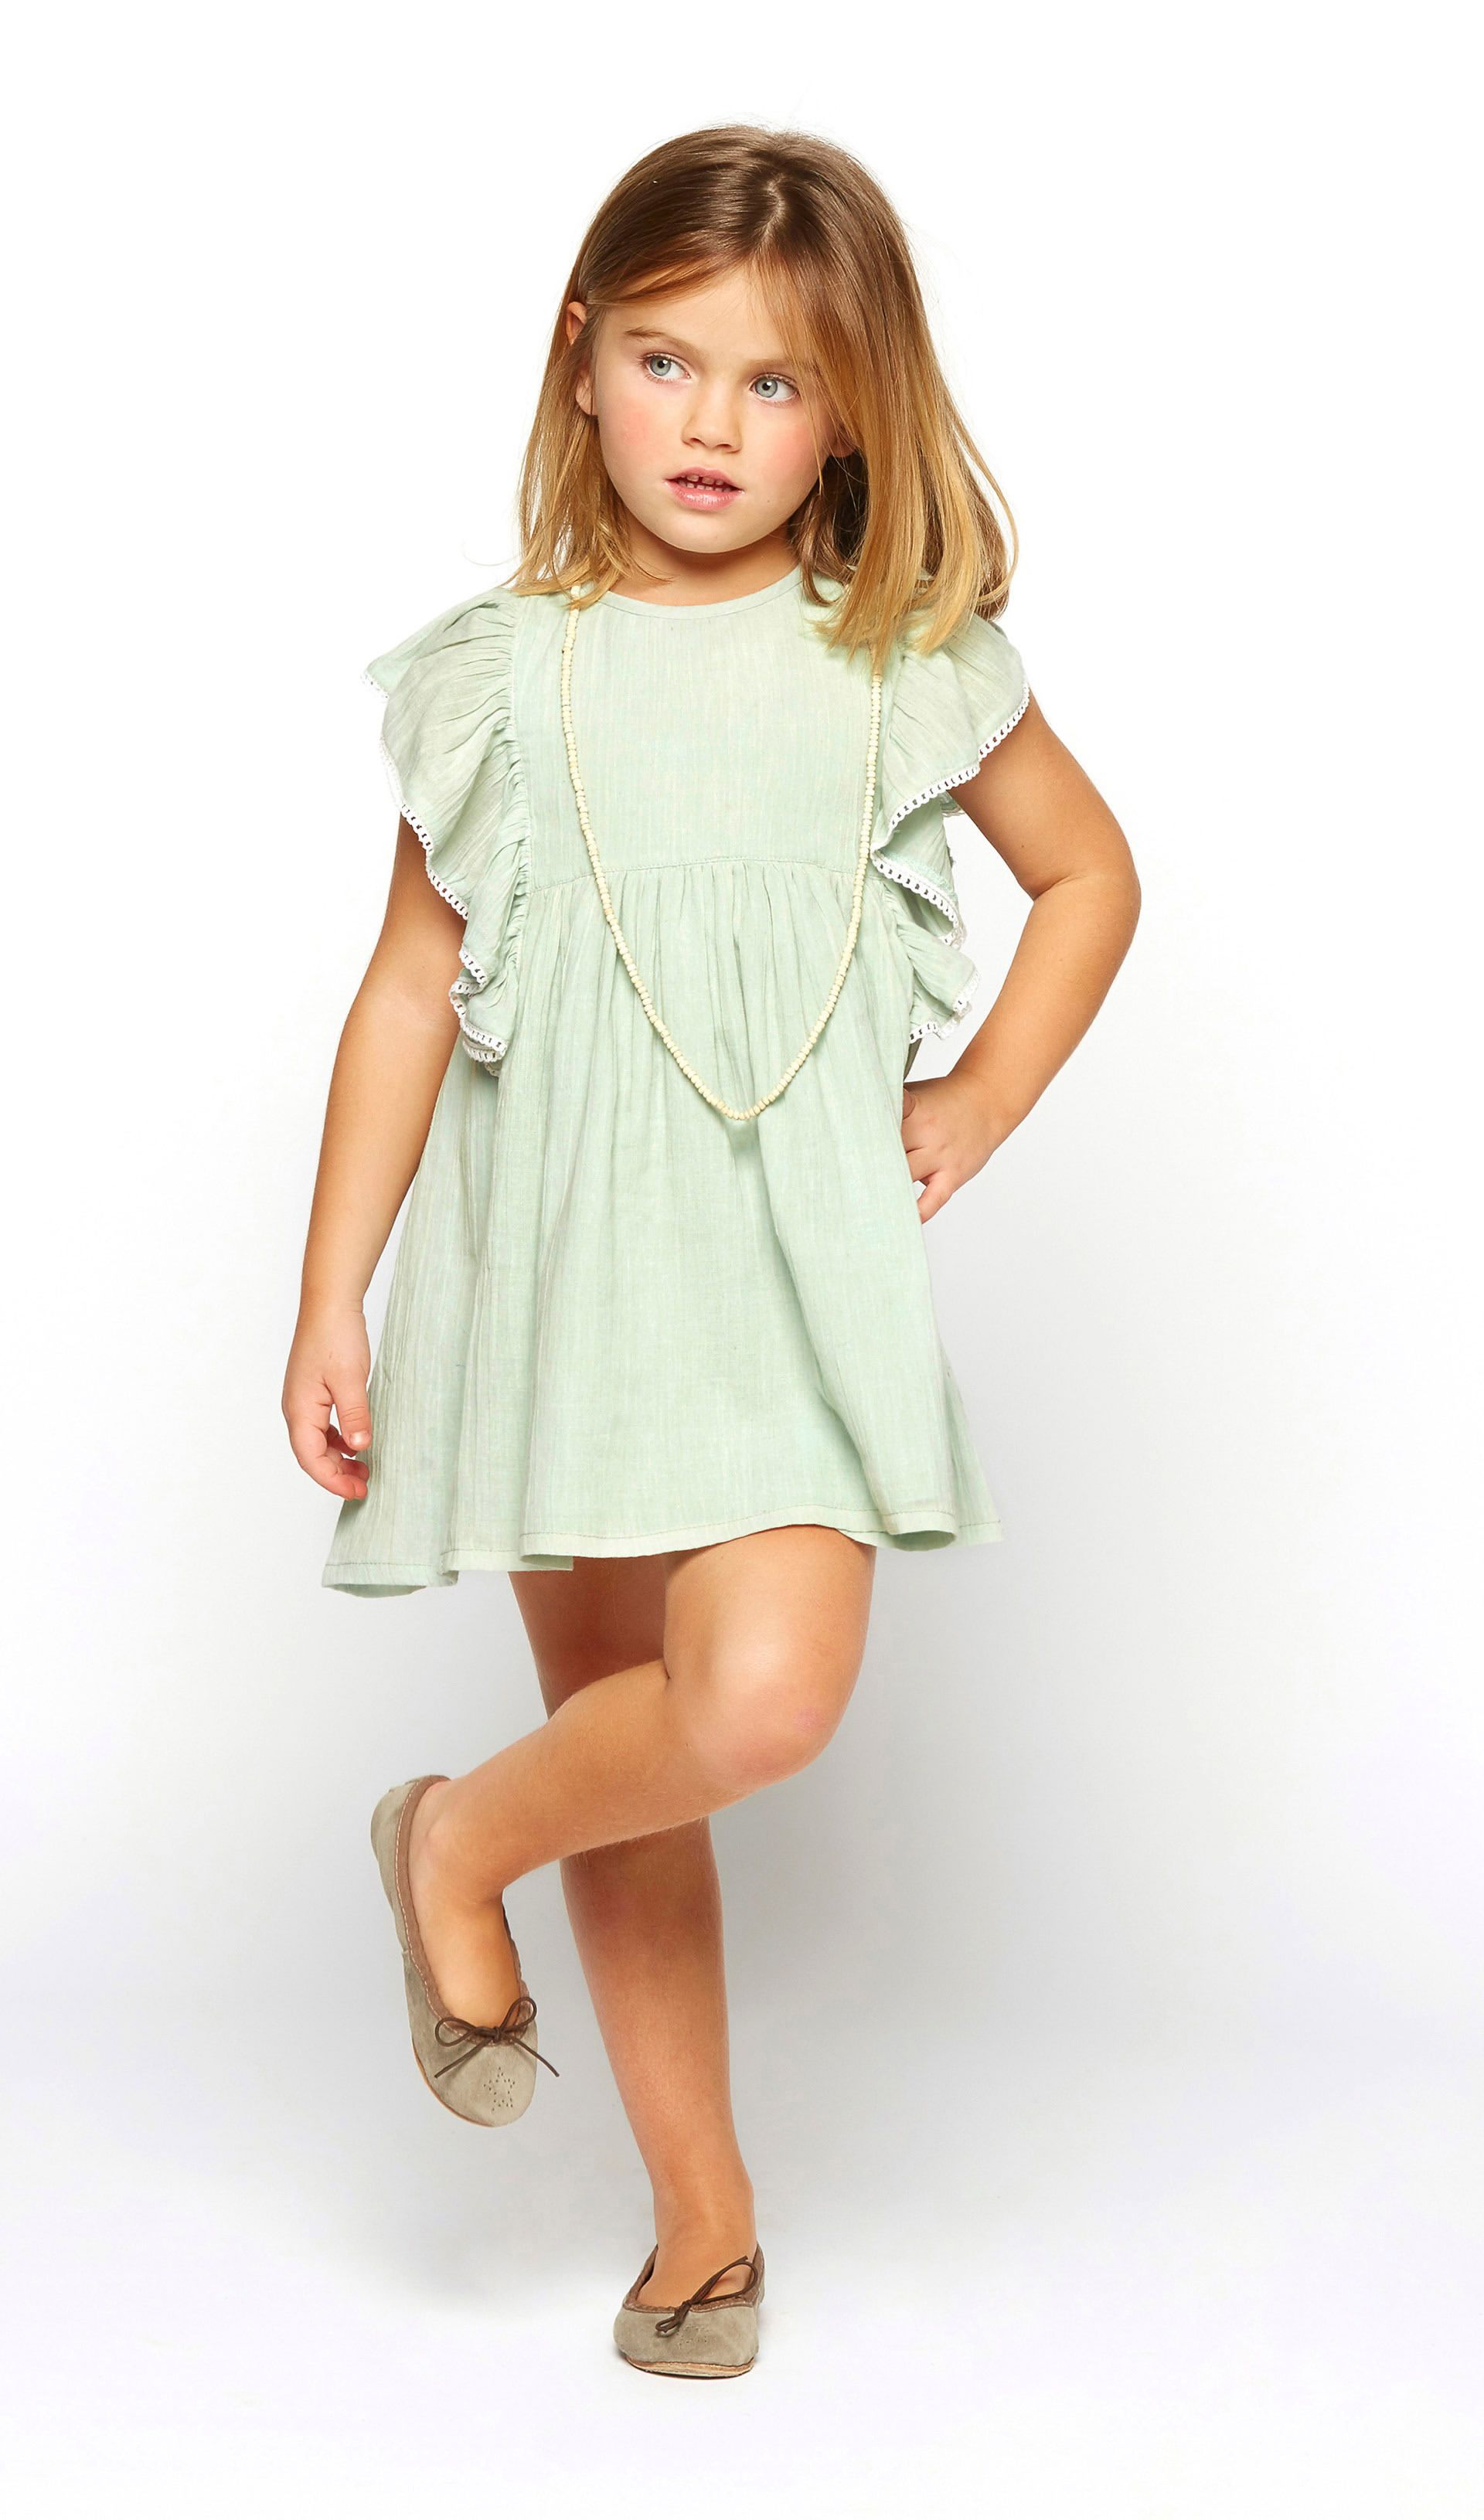 rechazo Círculo de rodamiento apaciguar  Ropa de Niña Online | Nícoli Nicoli L1701046-mna Mini | Moda para niñas,  Ropa de niña online, Vestidos para niñas